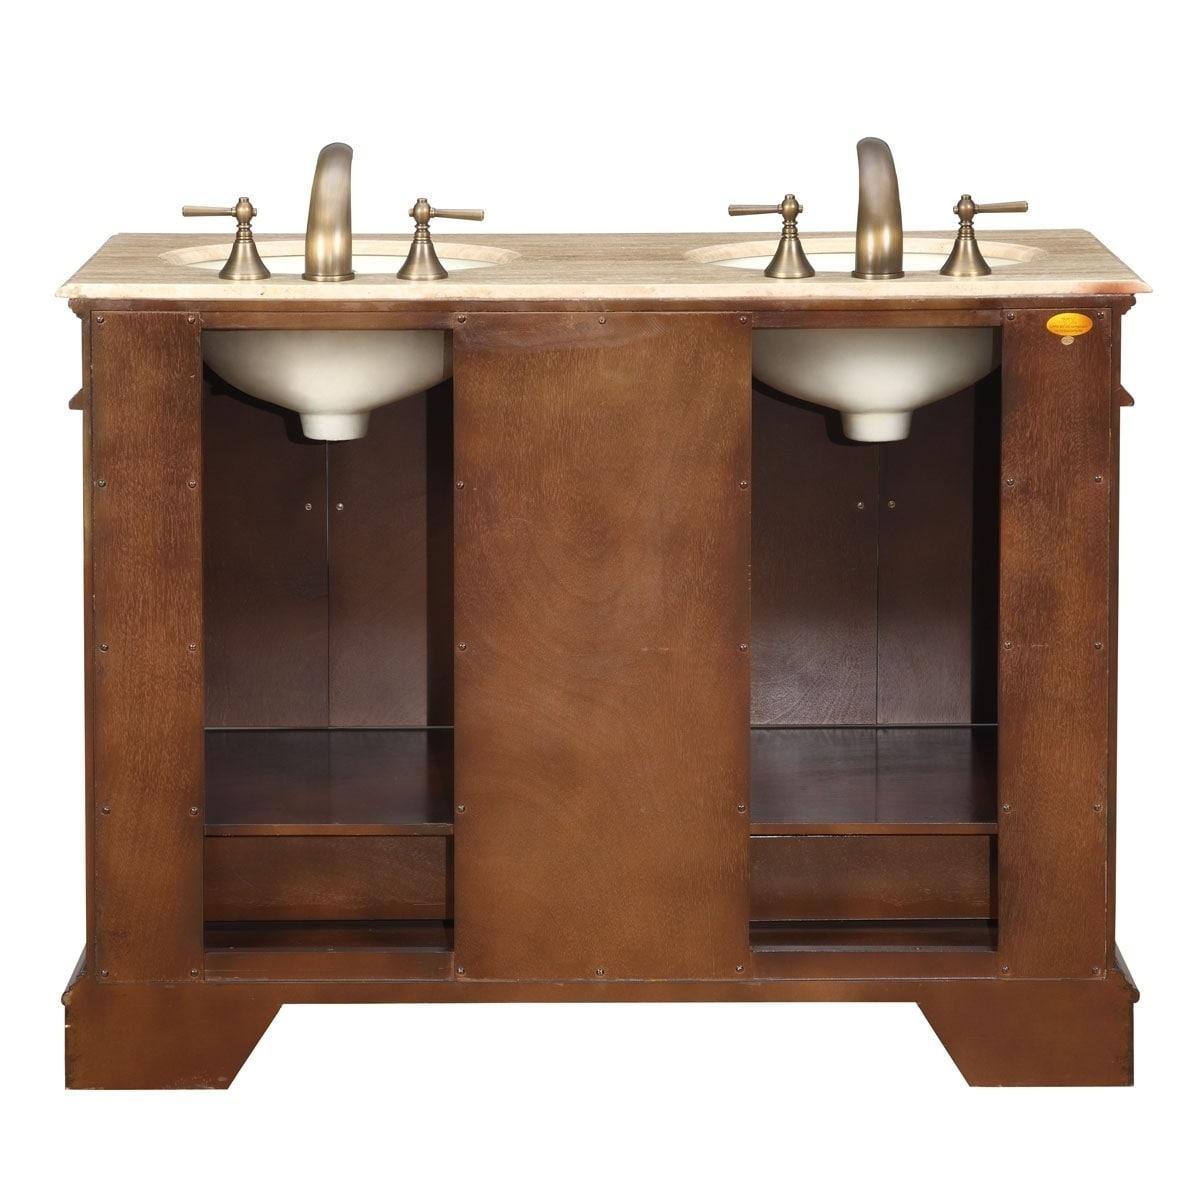 Shop Silkroad Exclusive Mesa 48 Inch Double Sink Bathroom Vanity